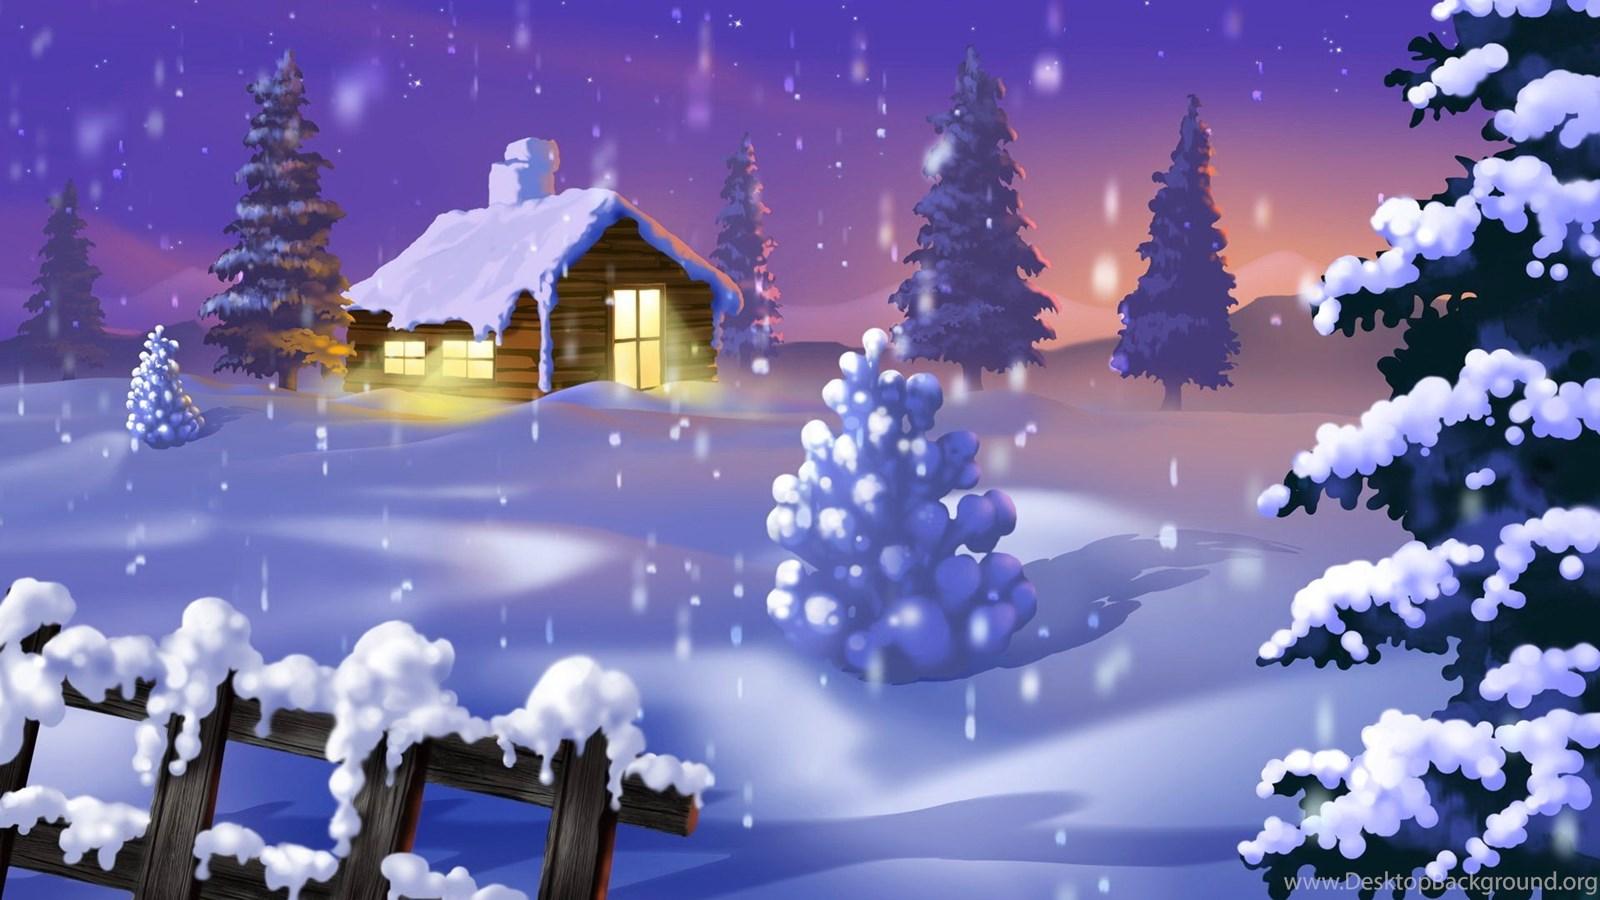 Celebration Background Hd: Christmas Celebration HD Wallpapers Pictures Desktop